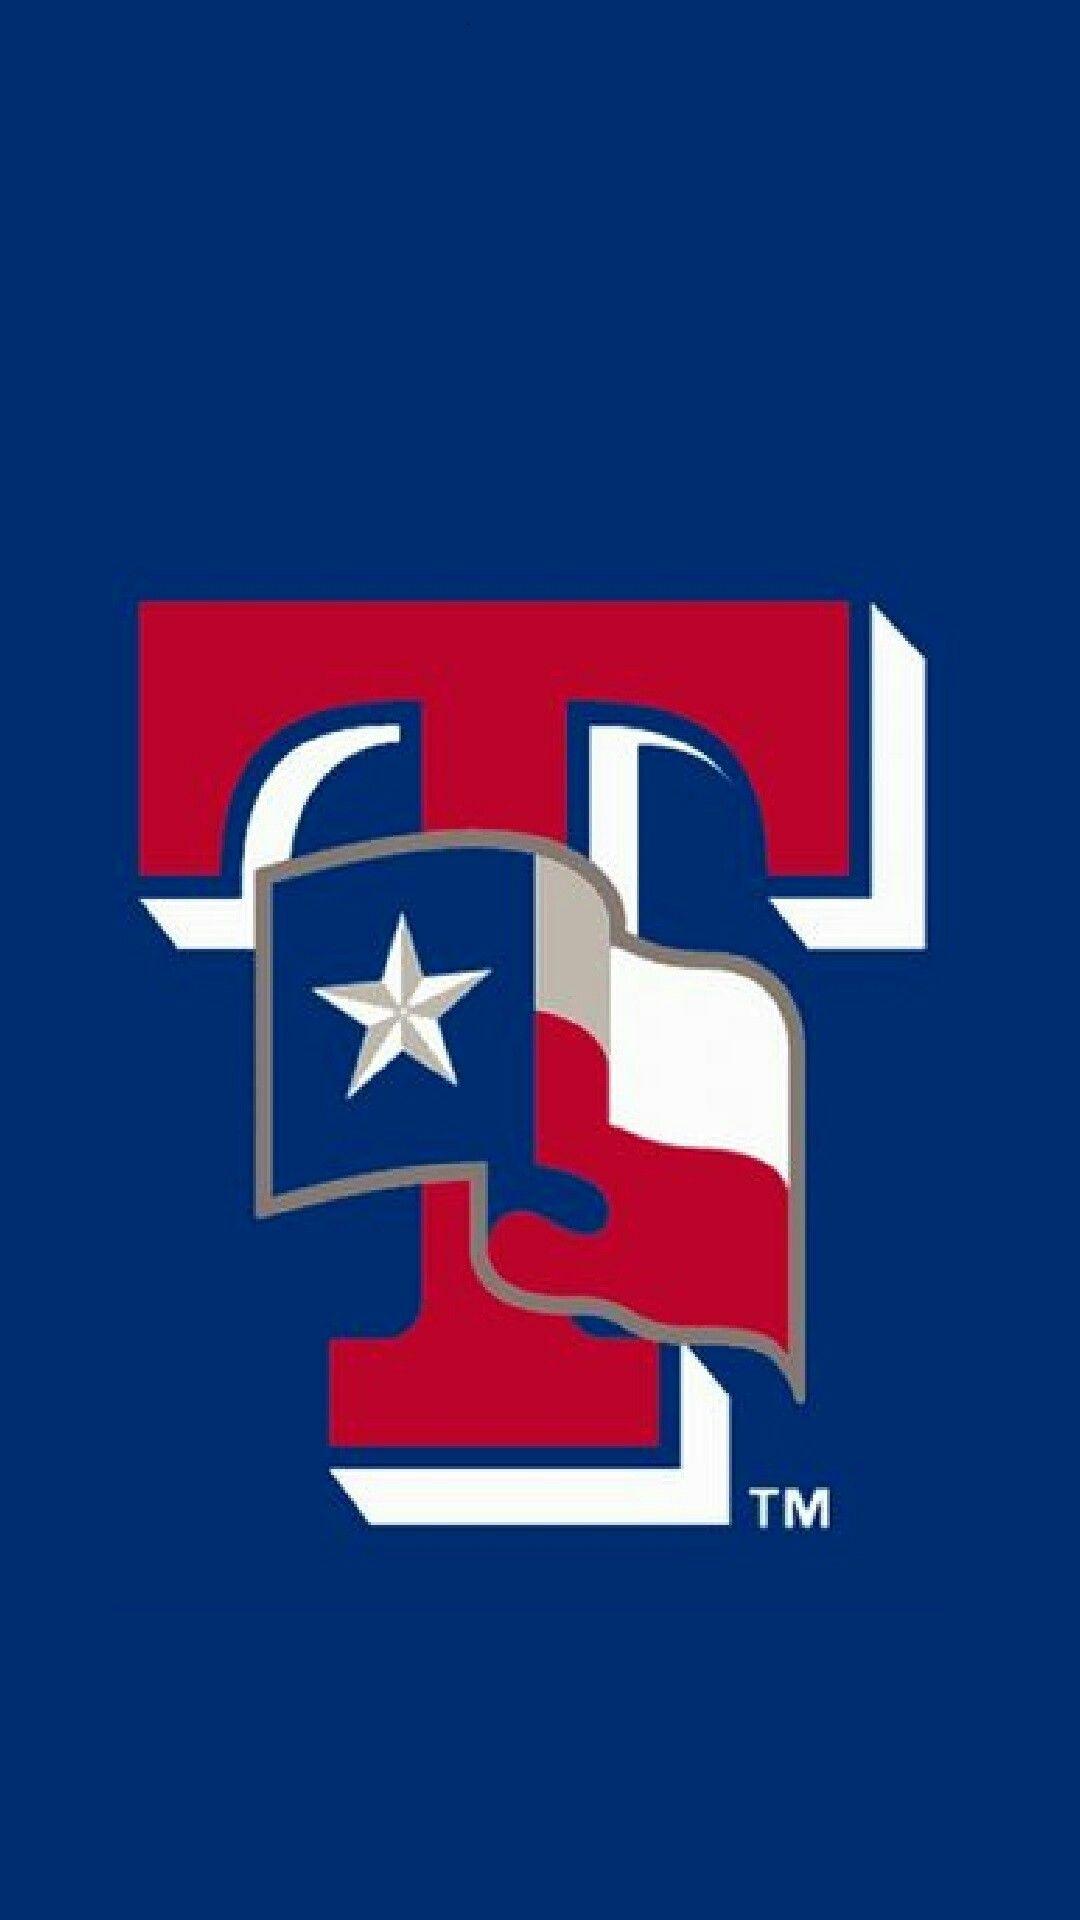 Texas Rangers Texas Rangers Logo Texas Rangers Texas Rangers Wallpaper